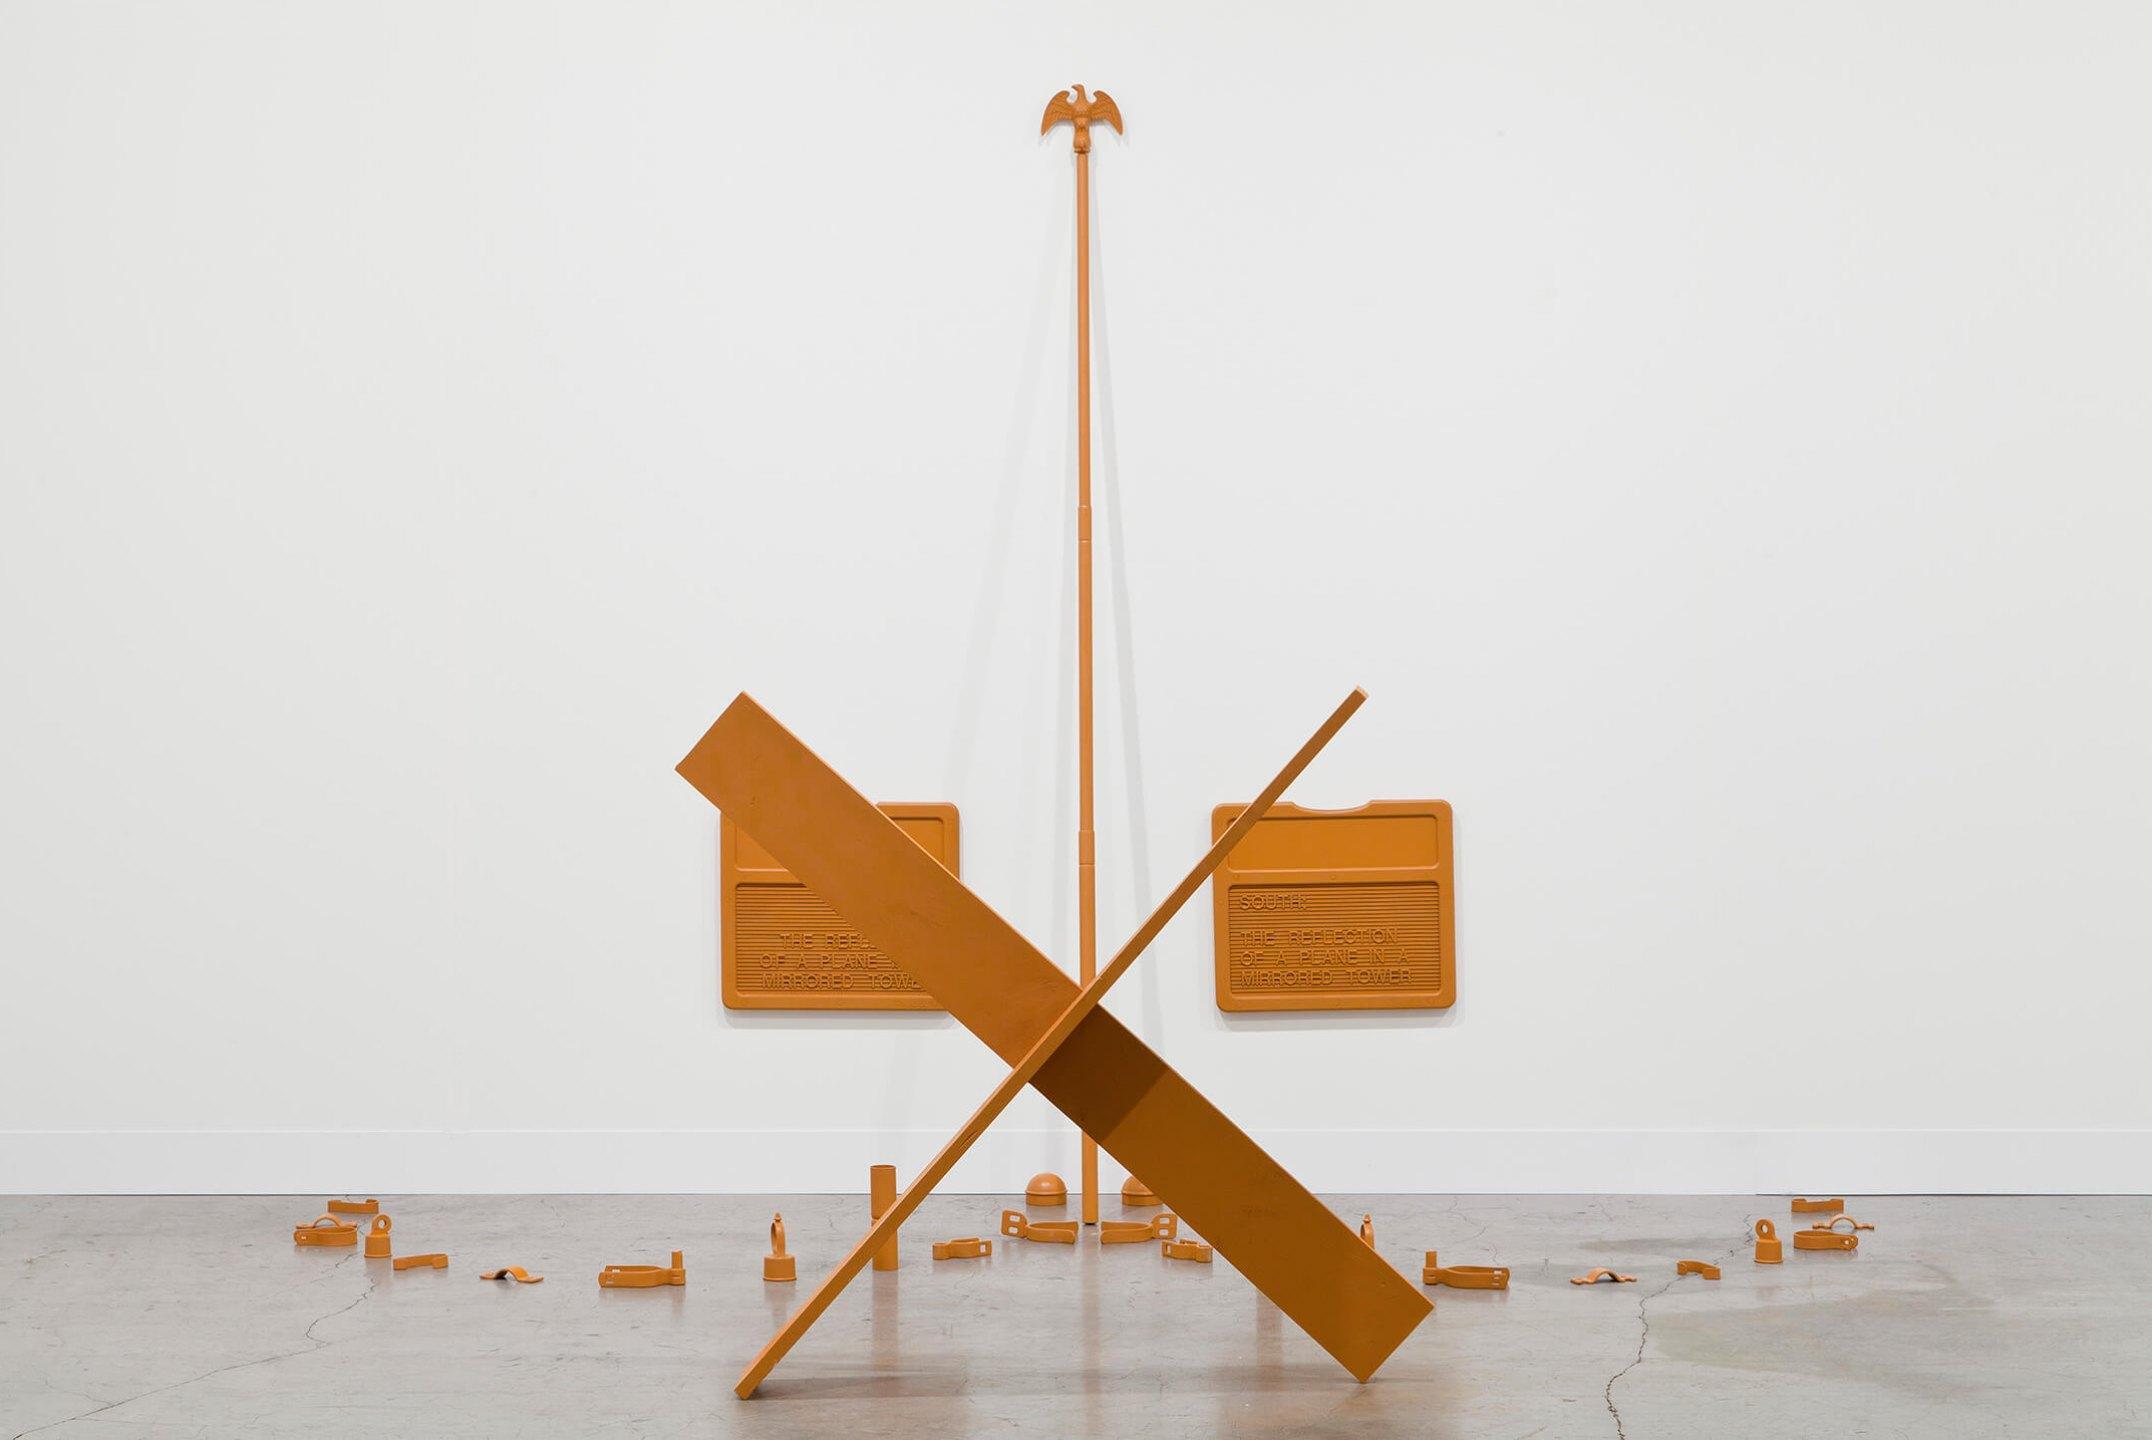 Deyson Gilbert,<em> 9/11=0,81818182 (the baby in daath)</em>, 2013, metal and plastic, 180 × 190 ×160 cm - Mendes Wood DM